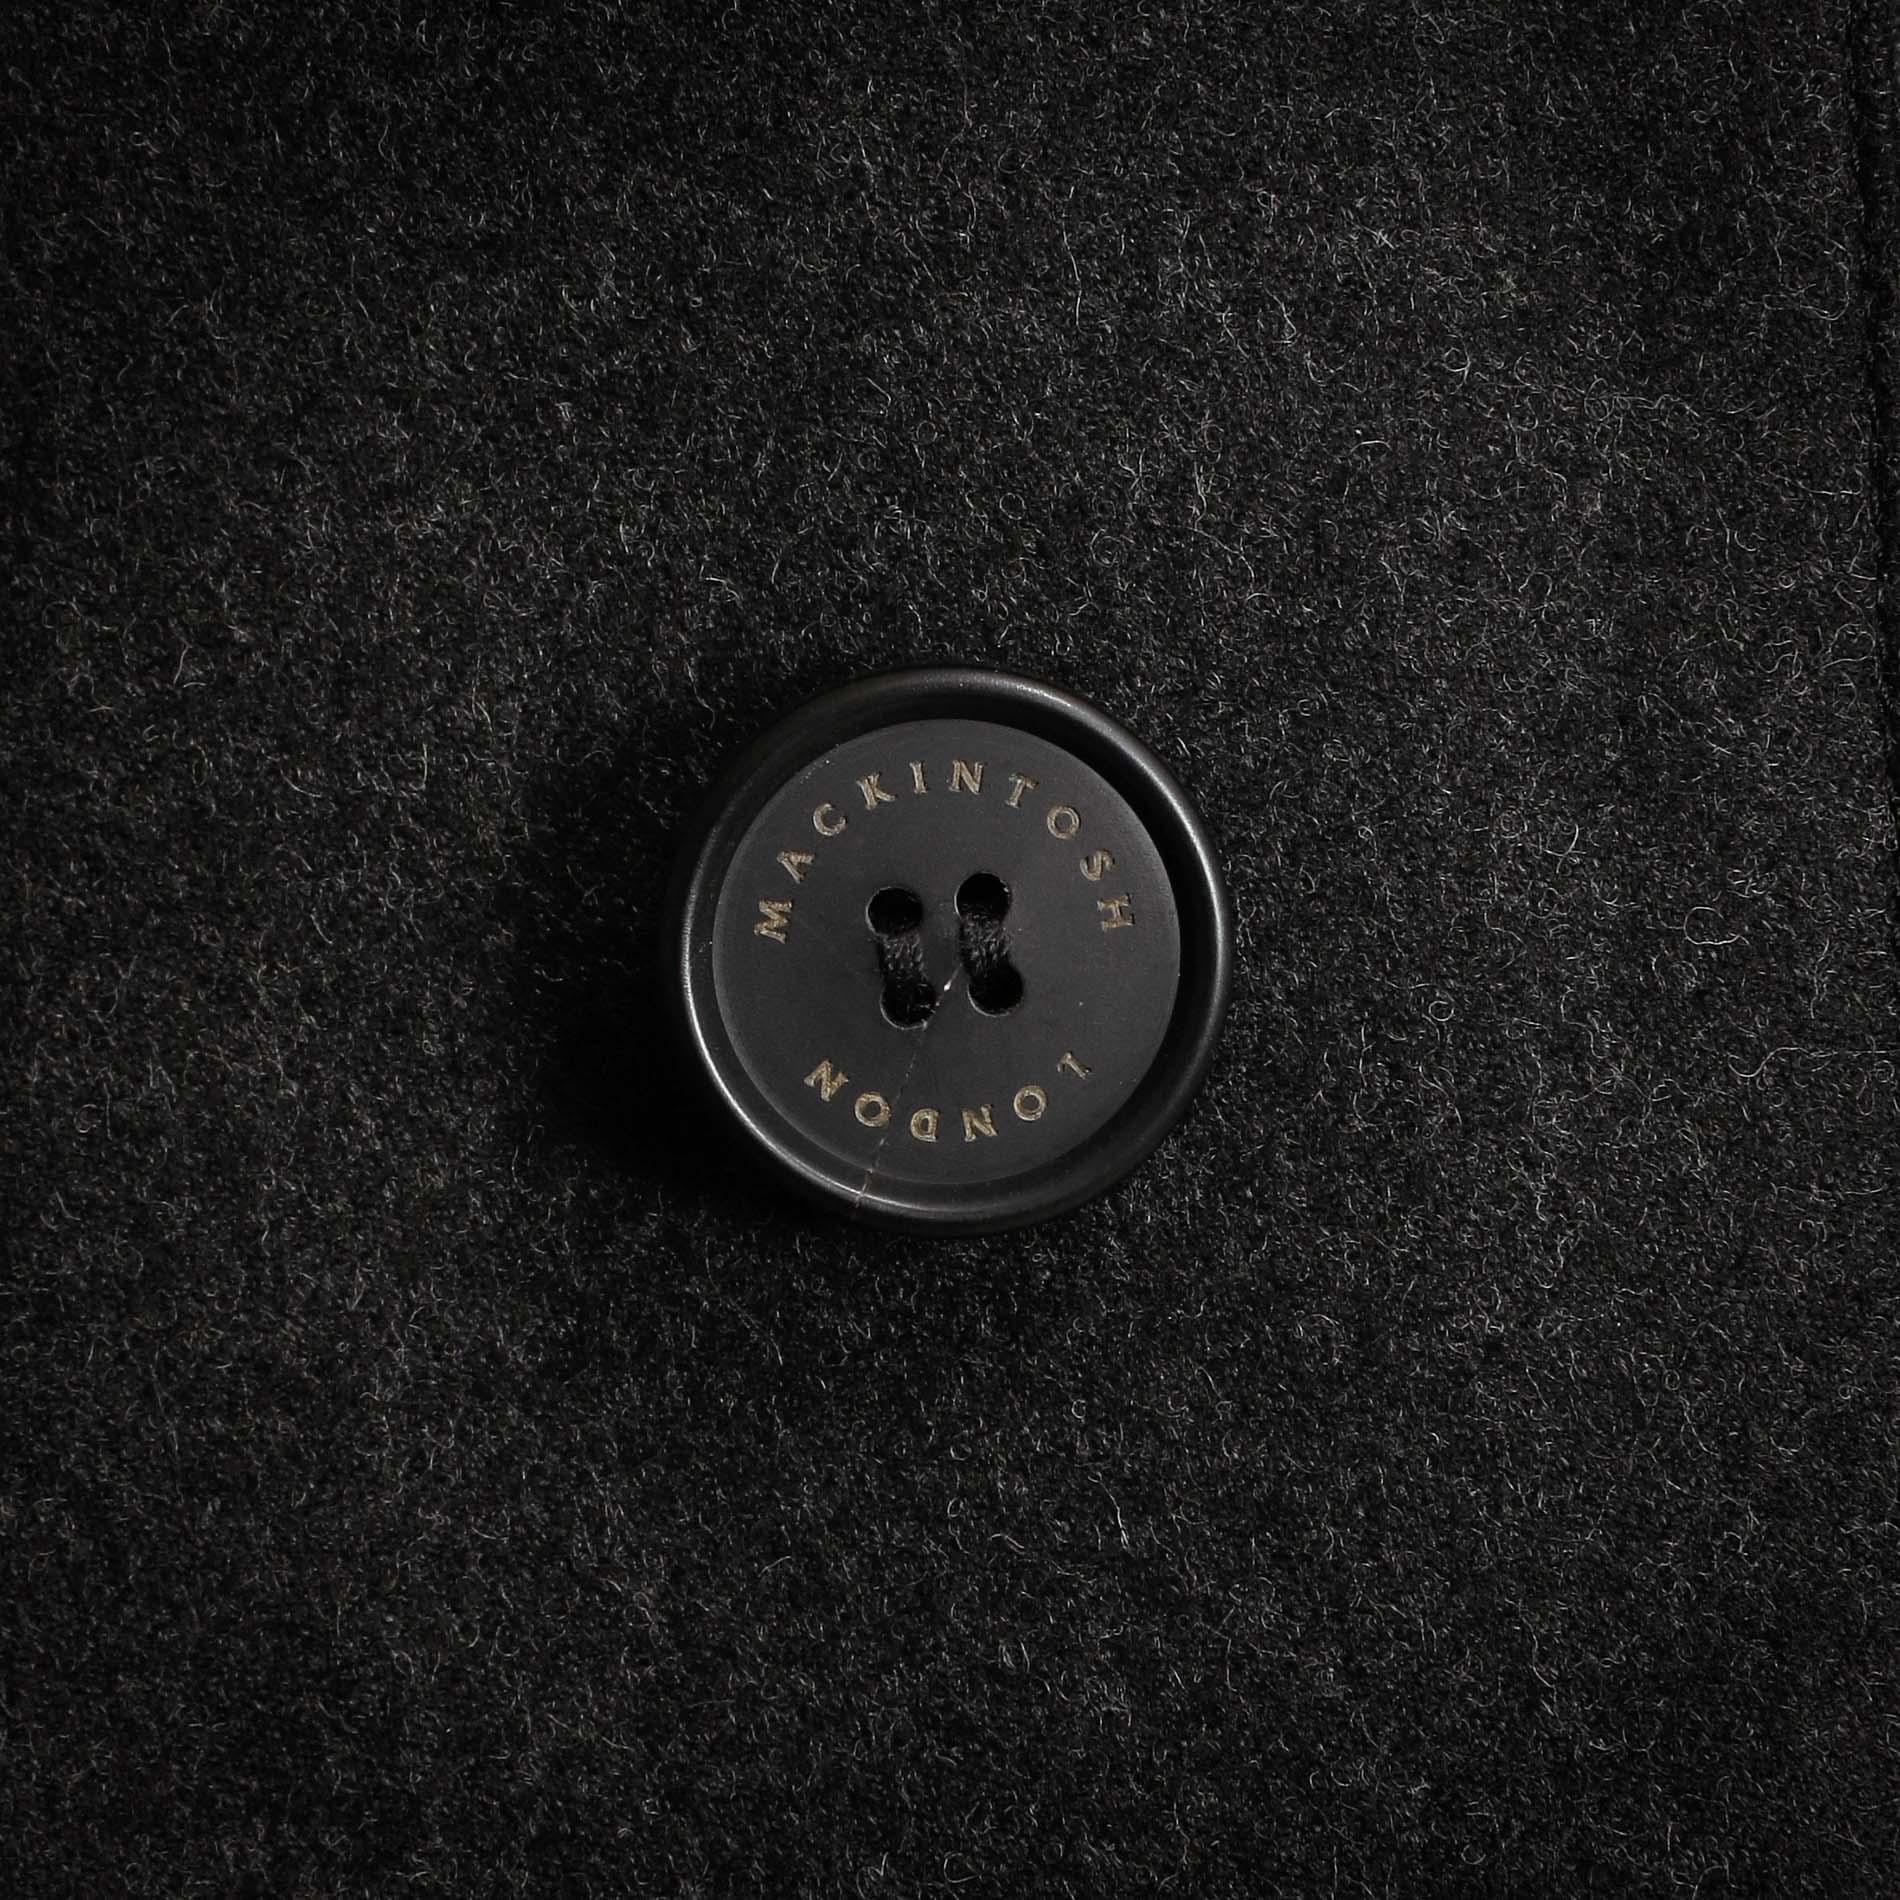 【DUNKELD ML】【Loro Piana/ロロ・ピアーナ】Favolaウールステンカラーコート